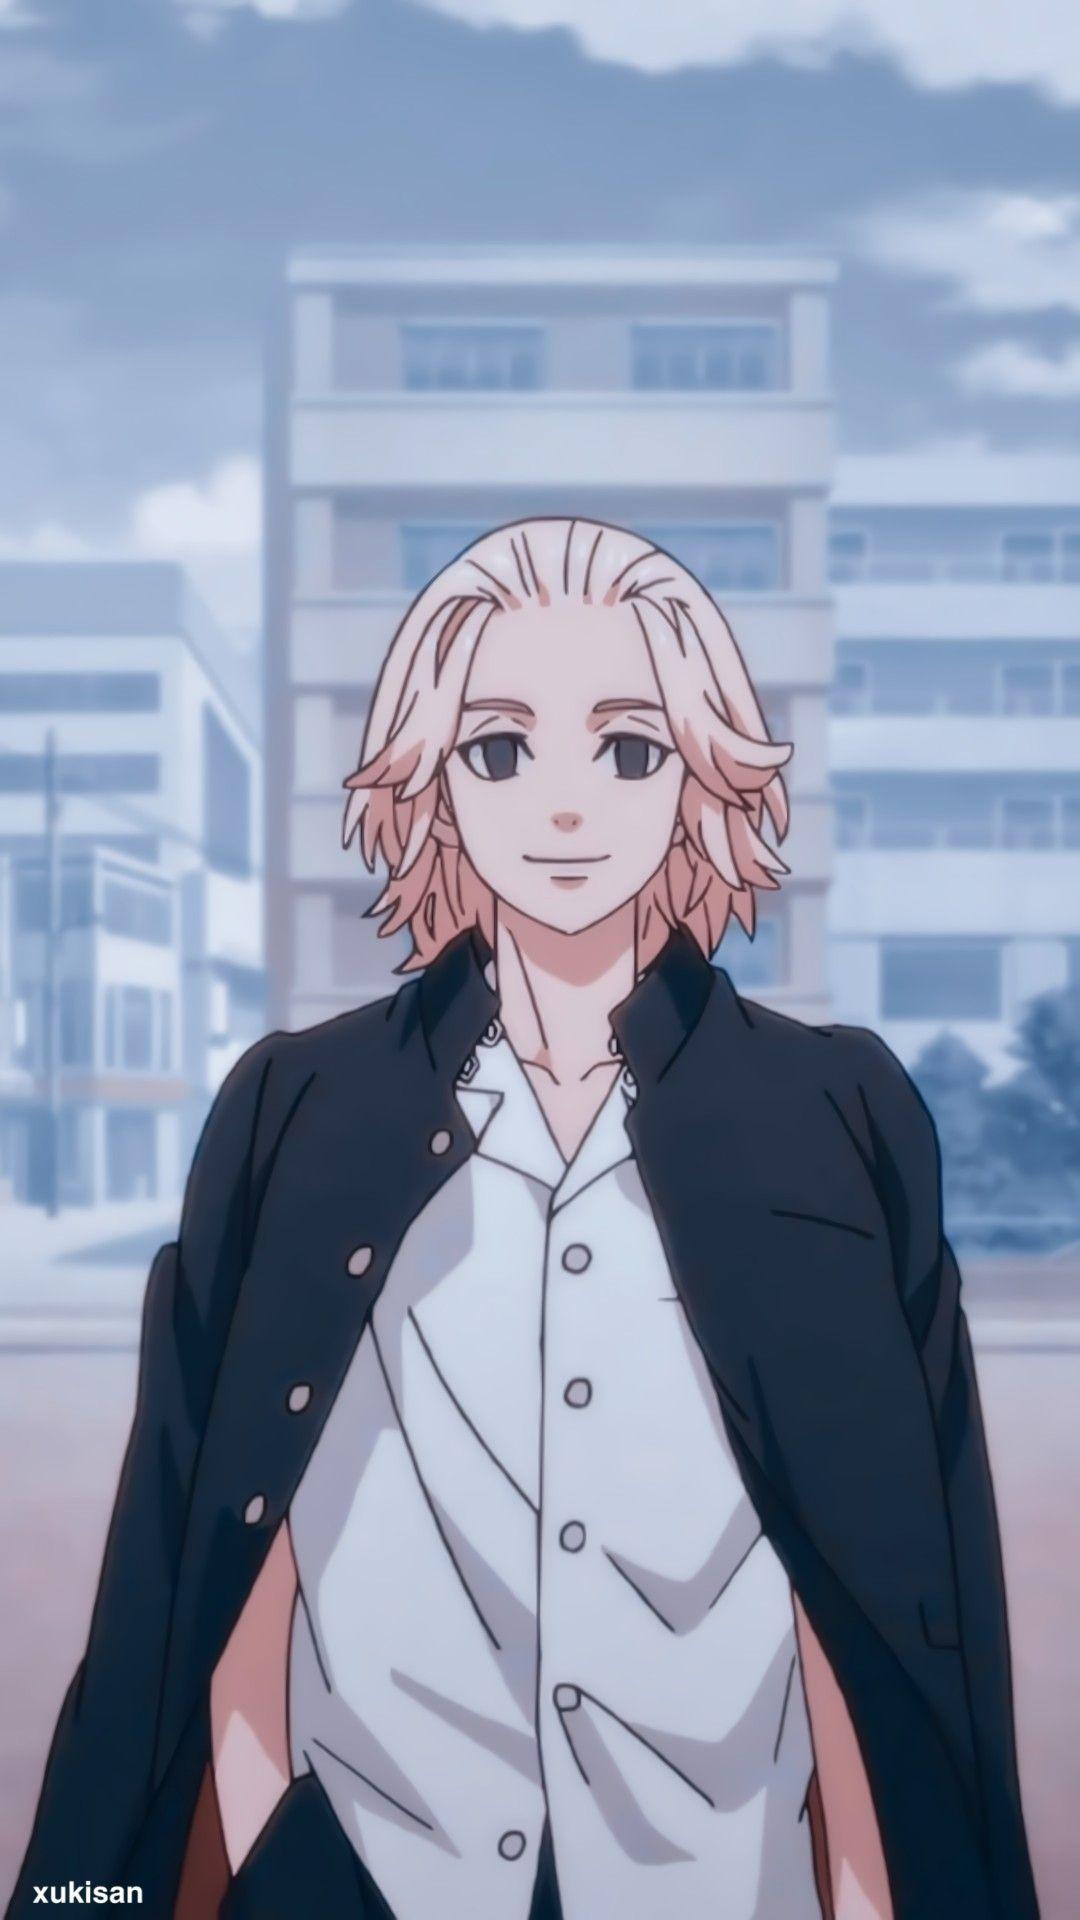 Mikey In 2021 Tokyo Ravens Cute Anime Guys Anime Akatsuki